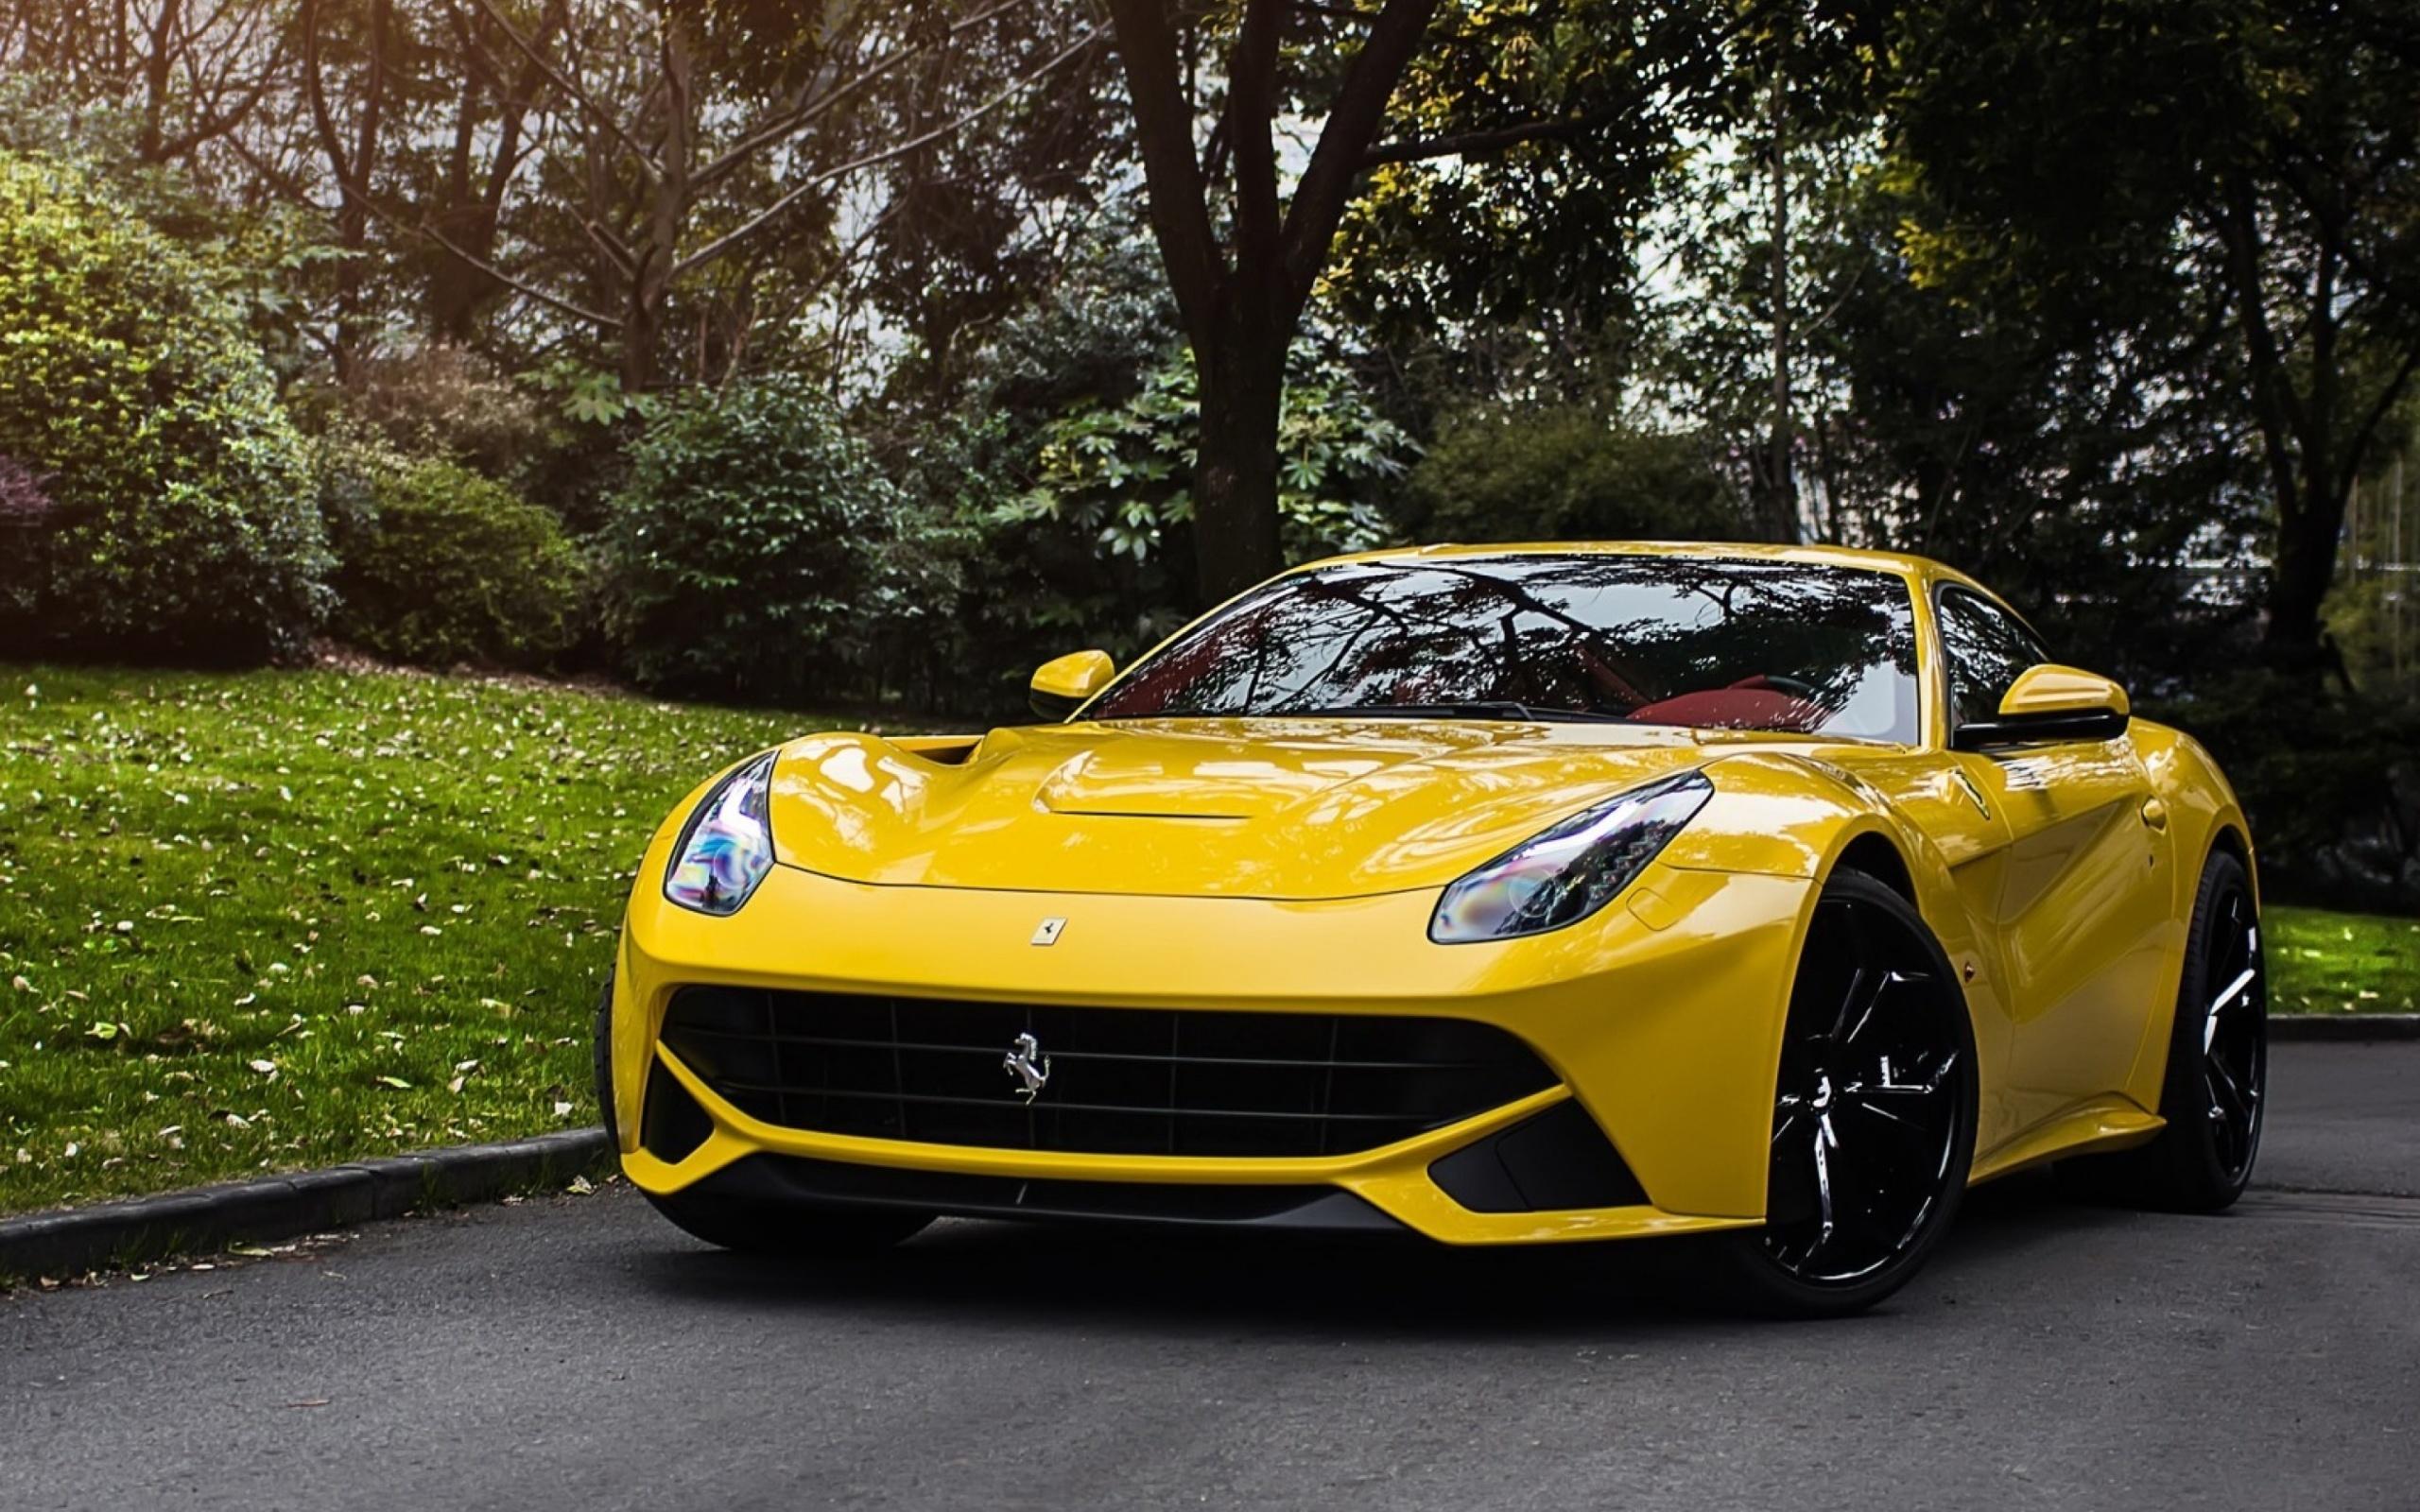 желтый спортивный автомобиль Ferrari F12 Berlinetta Wheelsandmore  № 1564354 загрузить